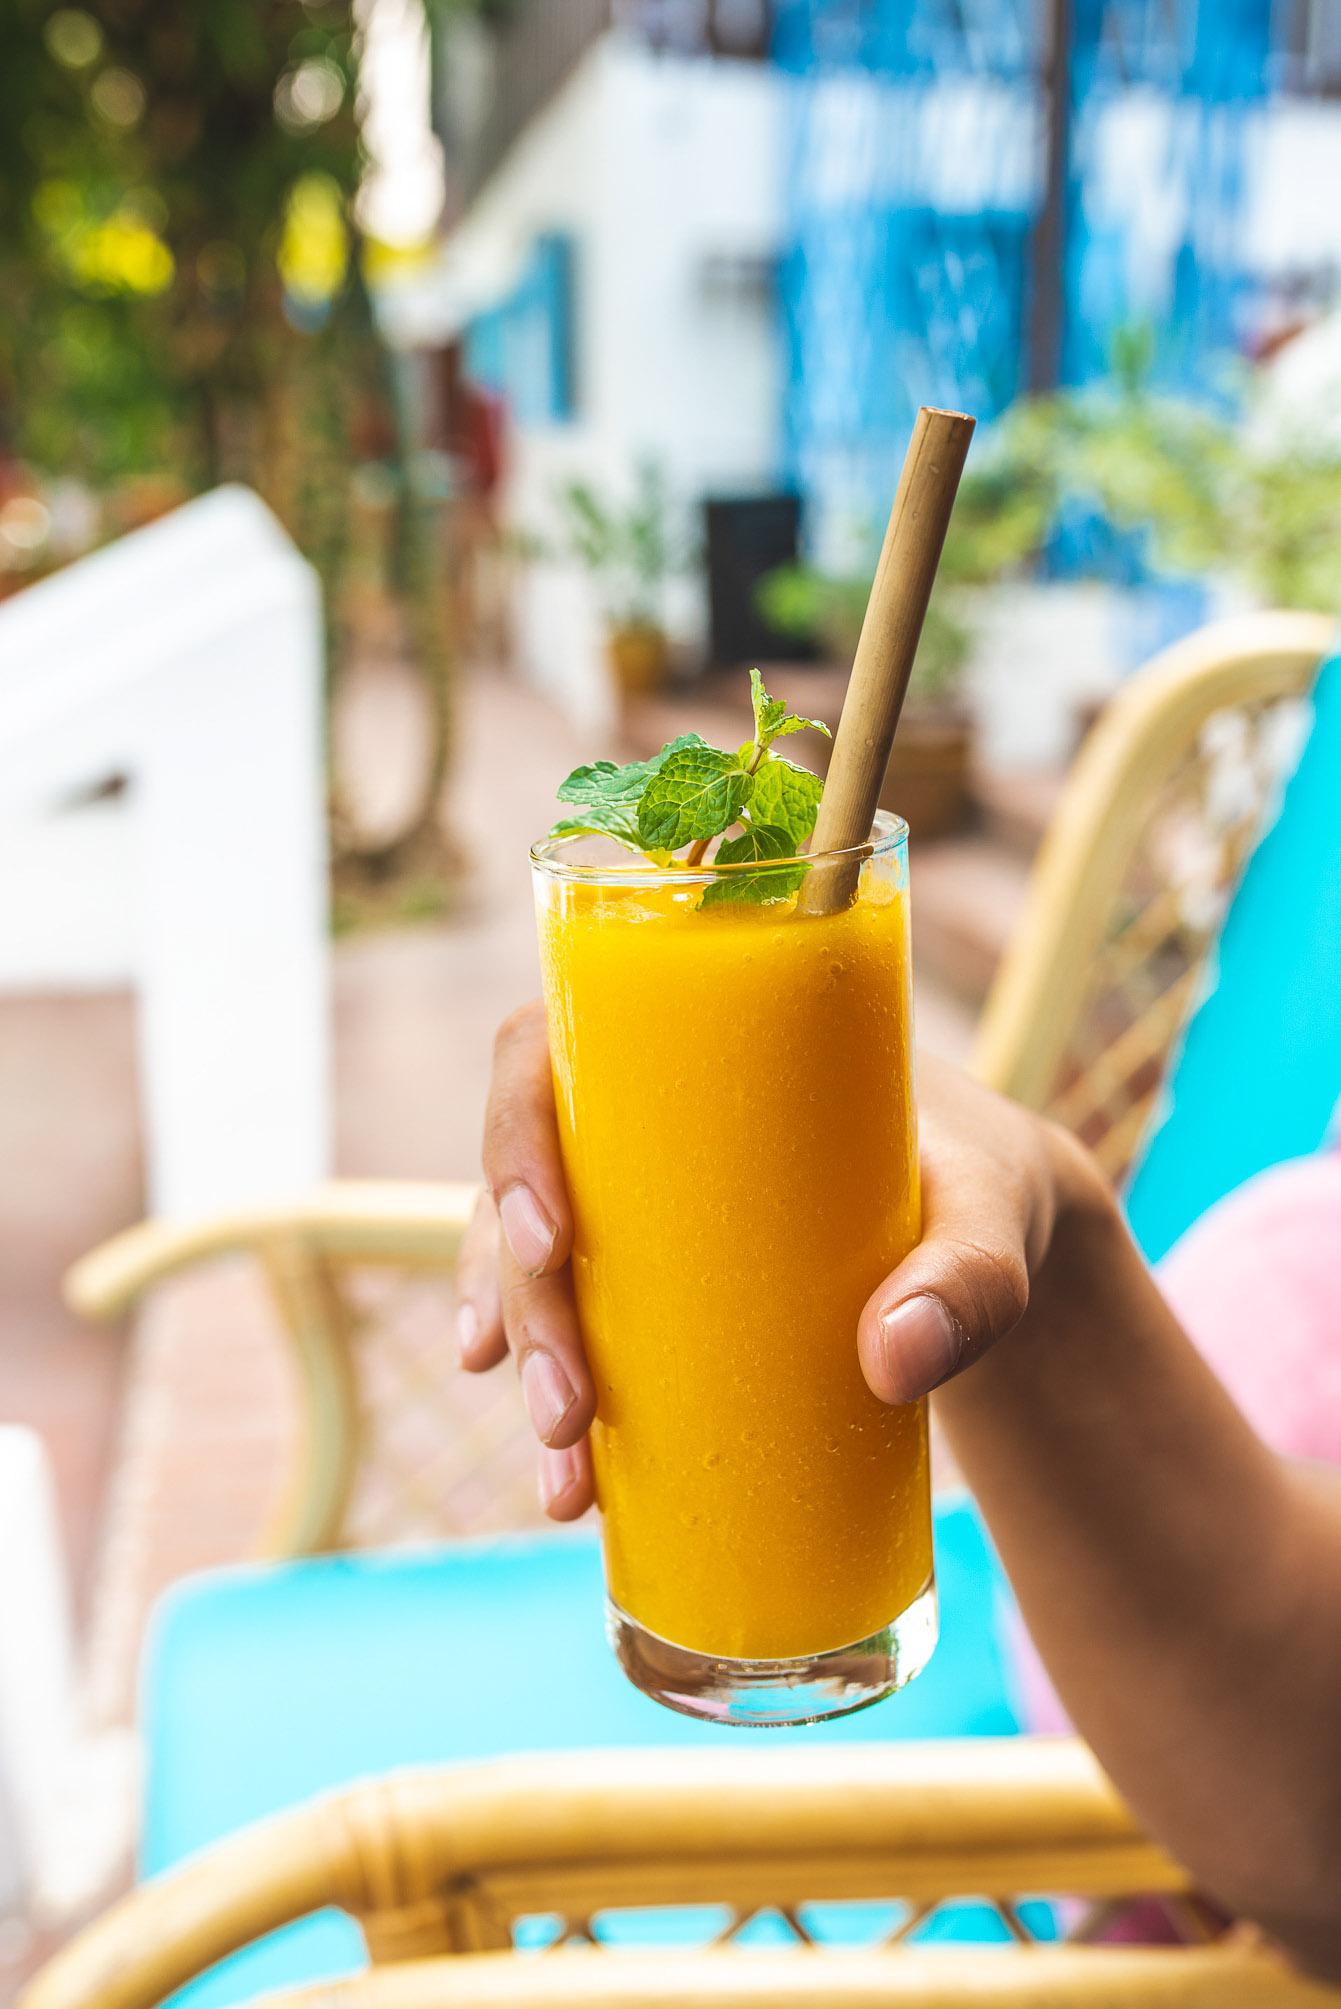 Soum Noum Restaurant Luang prabang